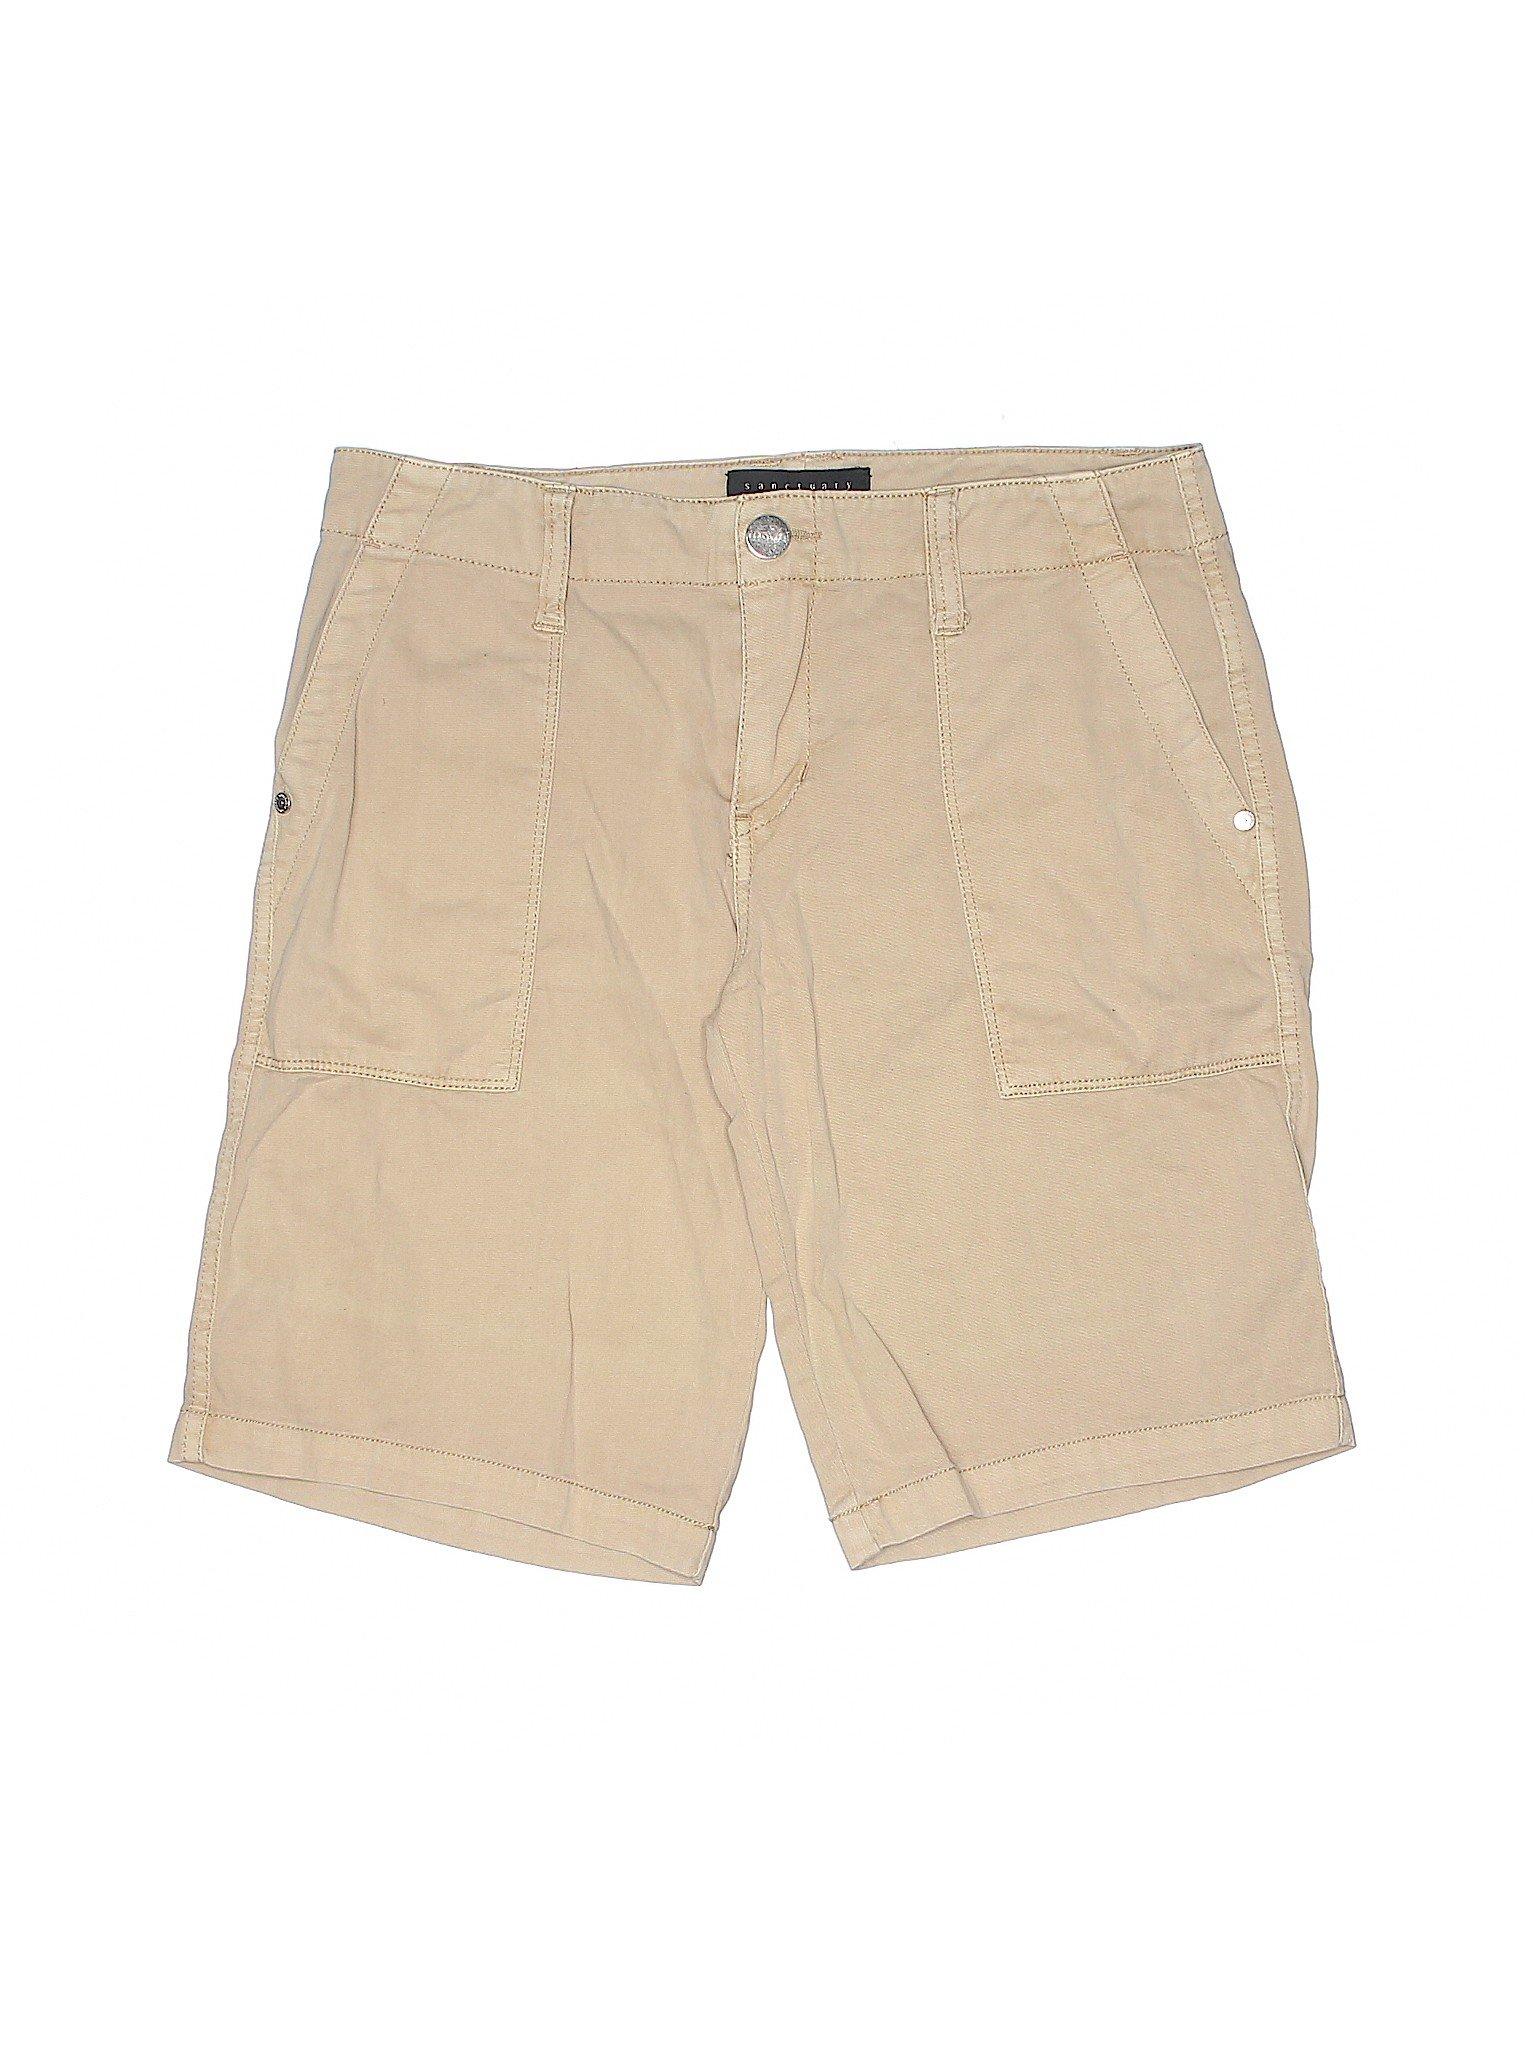 Shorts Khaki Khaki Sanctuary Shorts Khaki Boutique Boutique Sanctuary Boutique Sanctuary q7wOwa4z